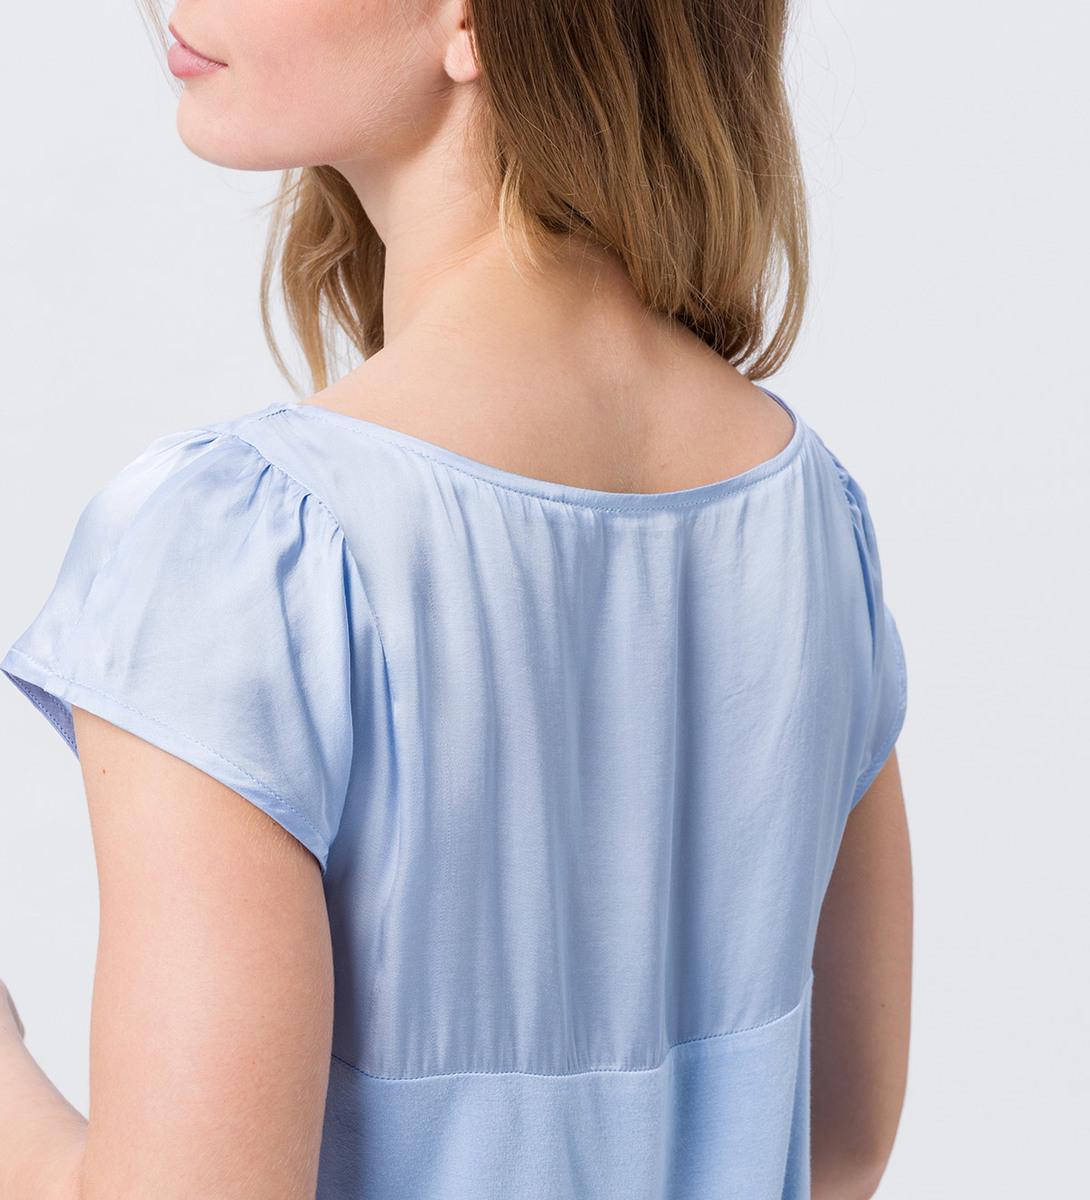 Blusenshirt im Materialmix in horizon blue